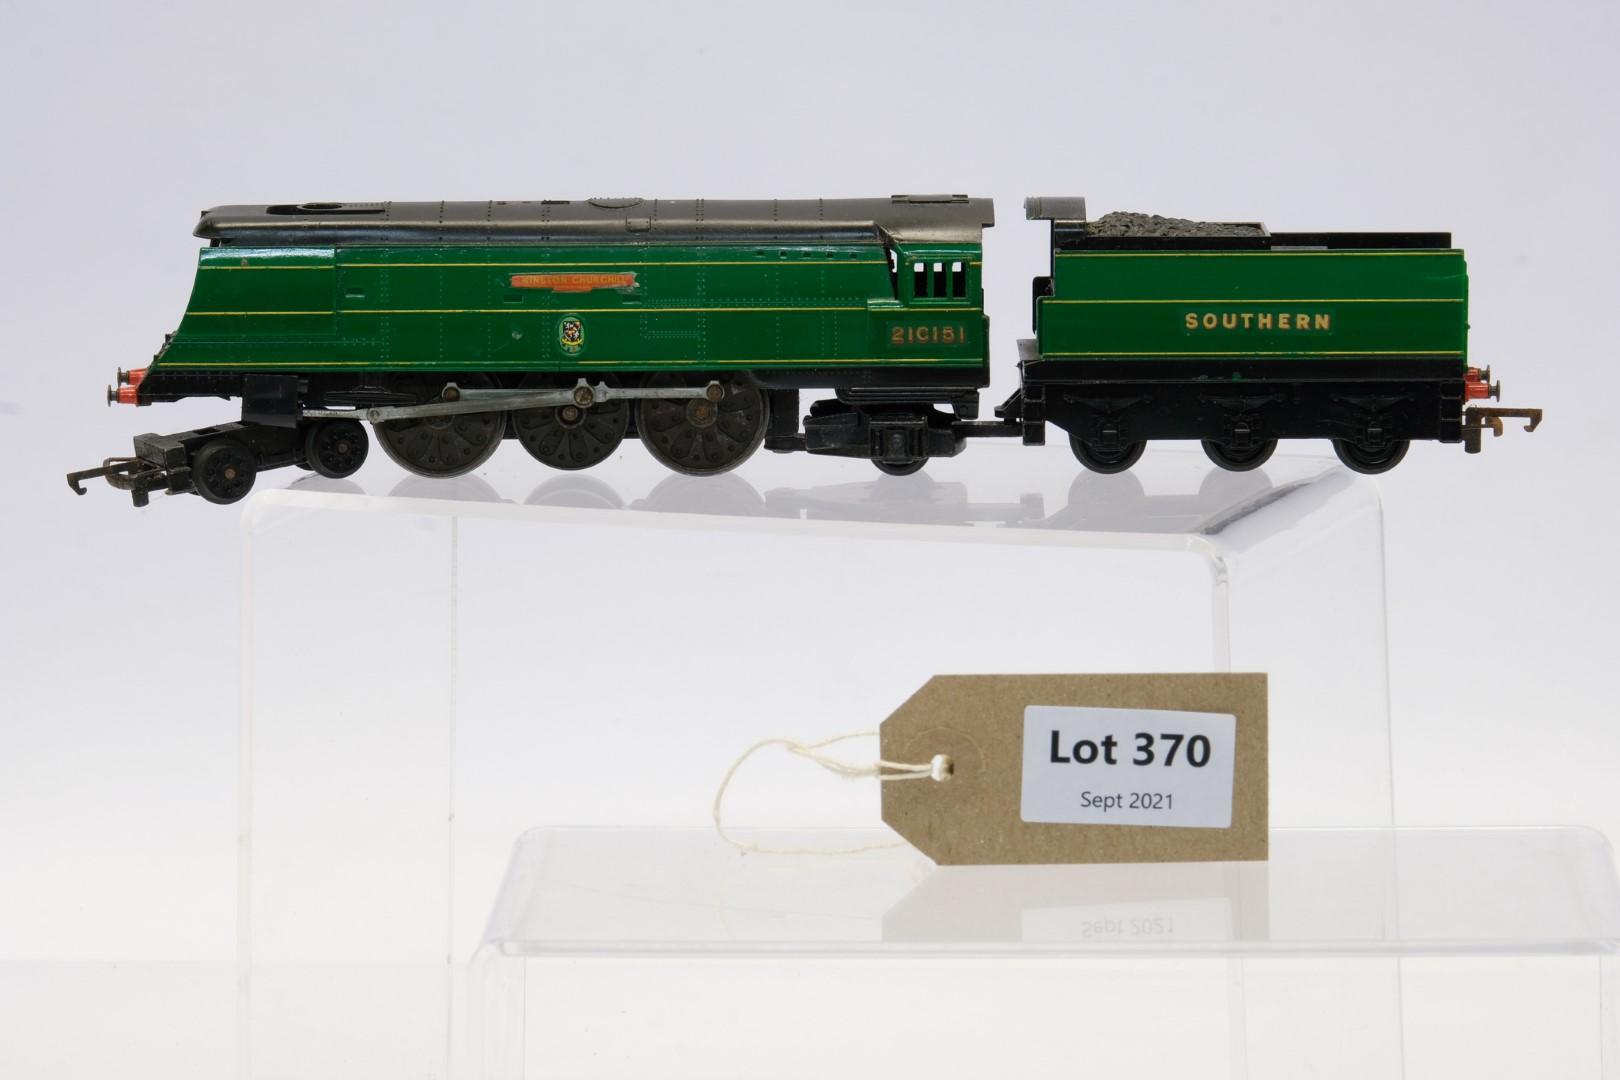 Tri-ang Winston Churchill Locomotive and Tender - Southern - 21C151 - No Box